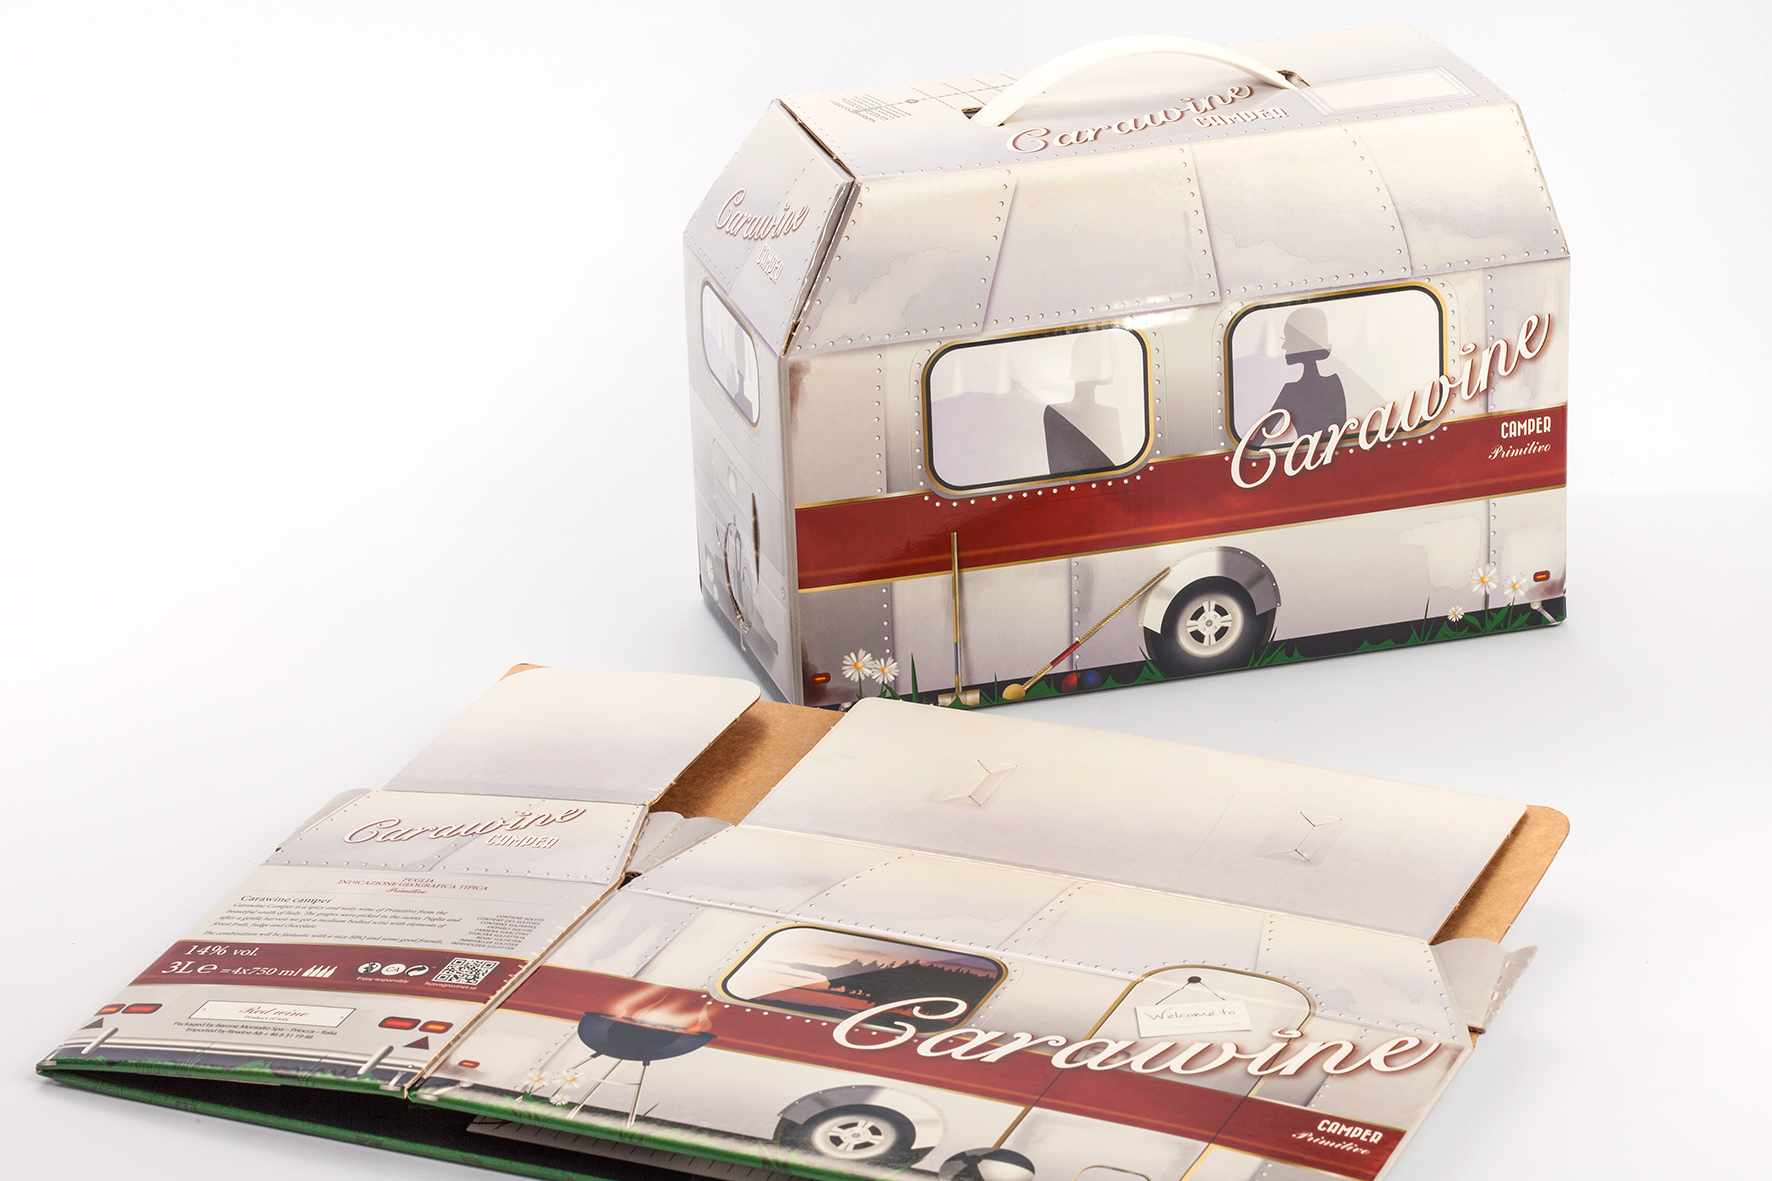 Astuccio Bag in Box Carawine Camper Primitivo Puglia